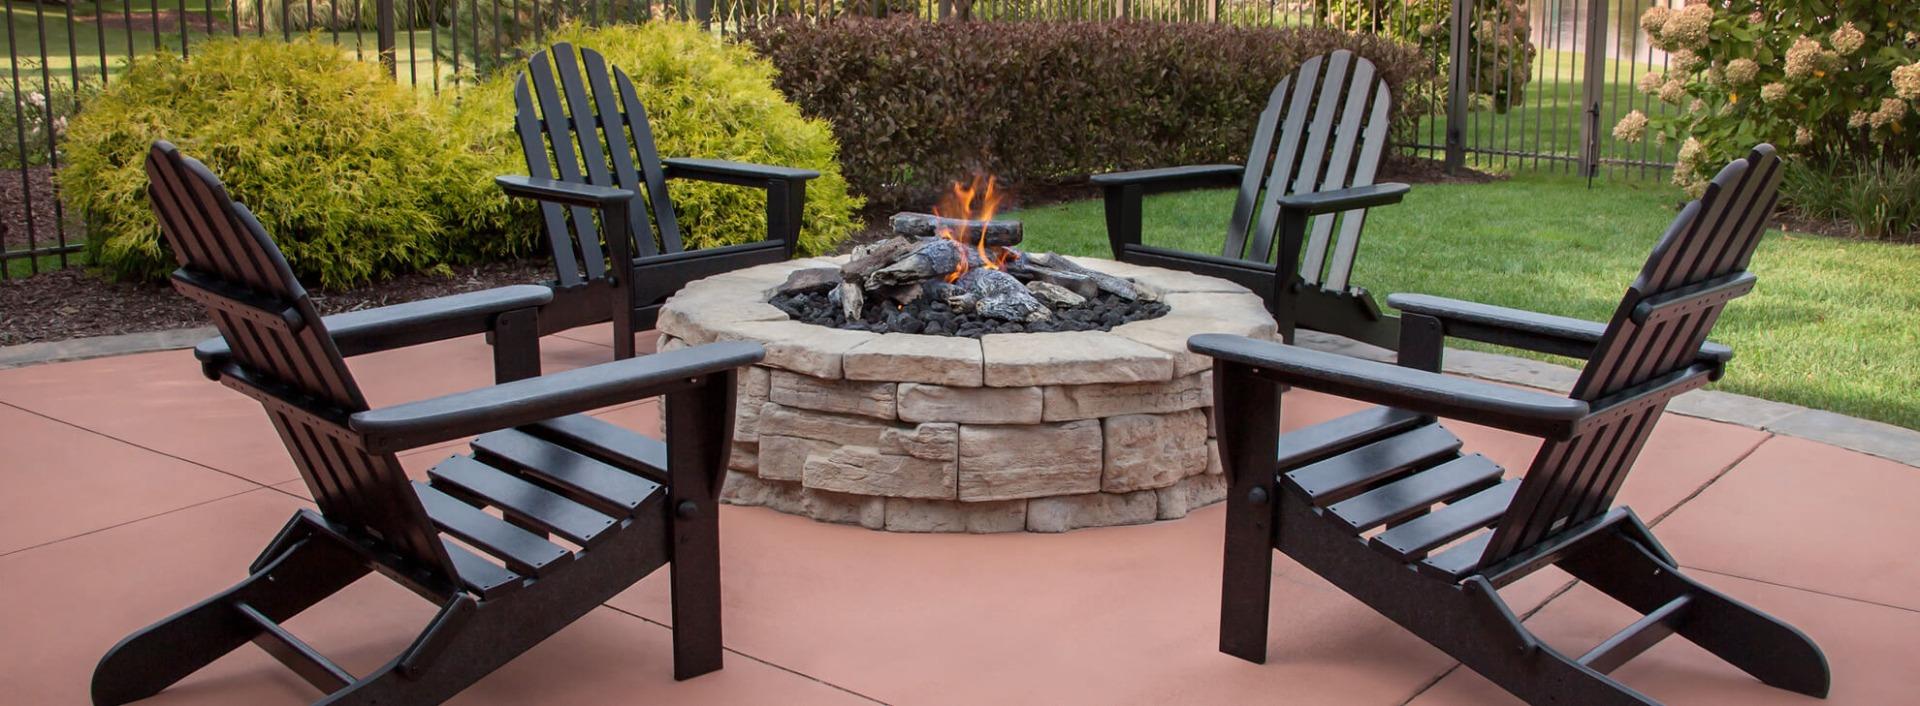 Black Adirondack Chairs around a fire pit